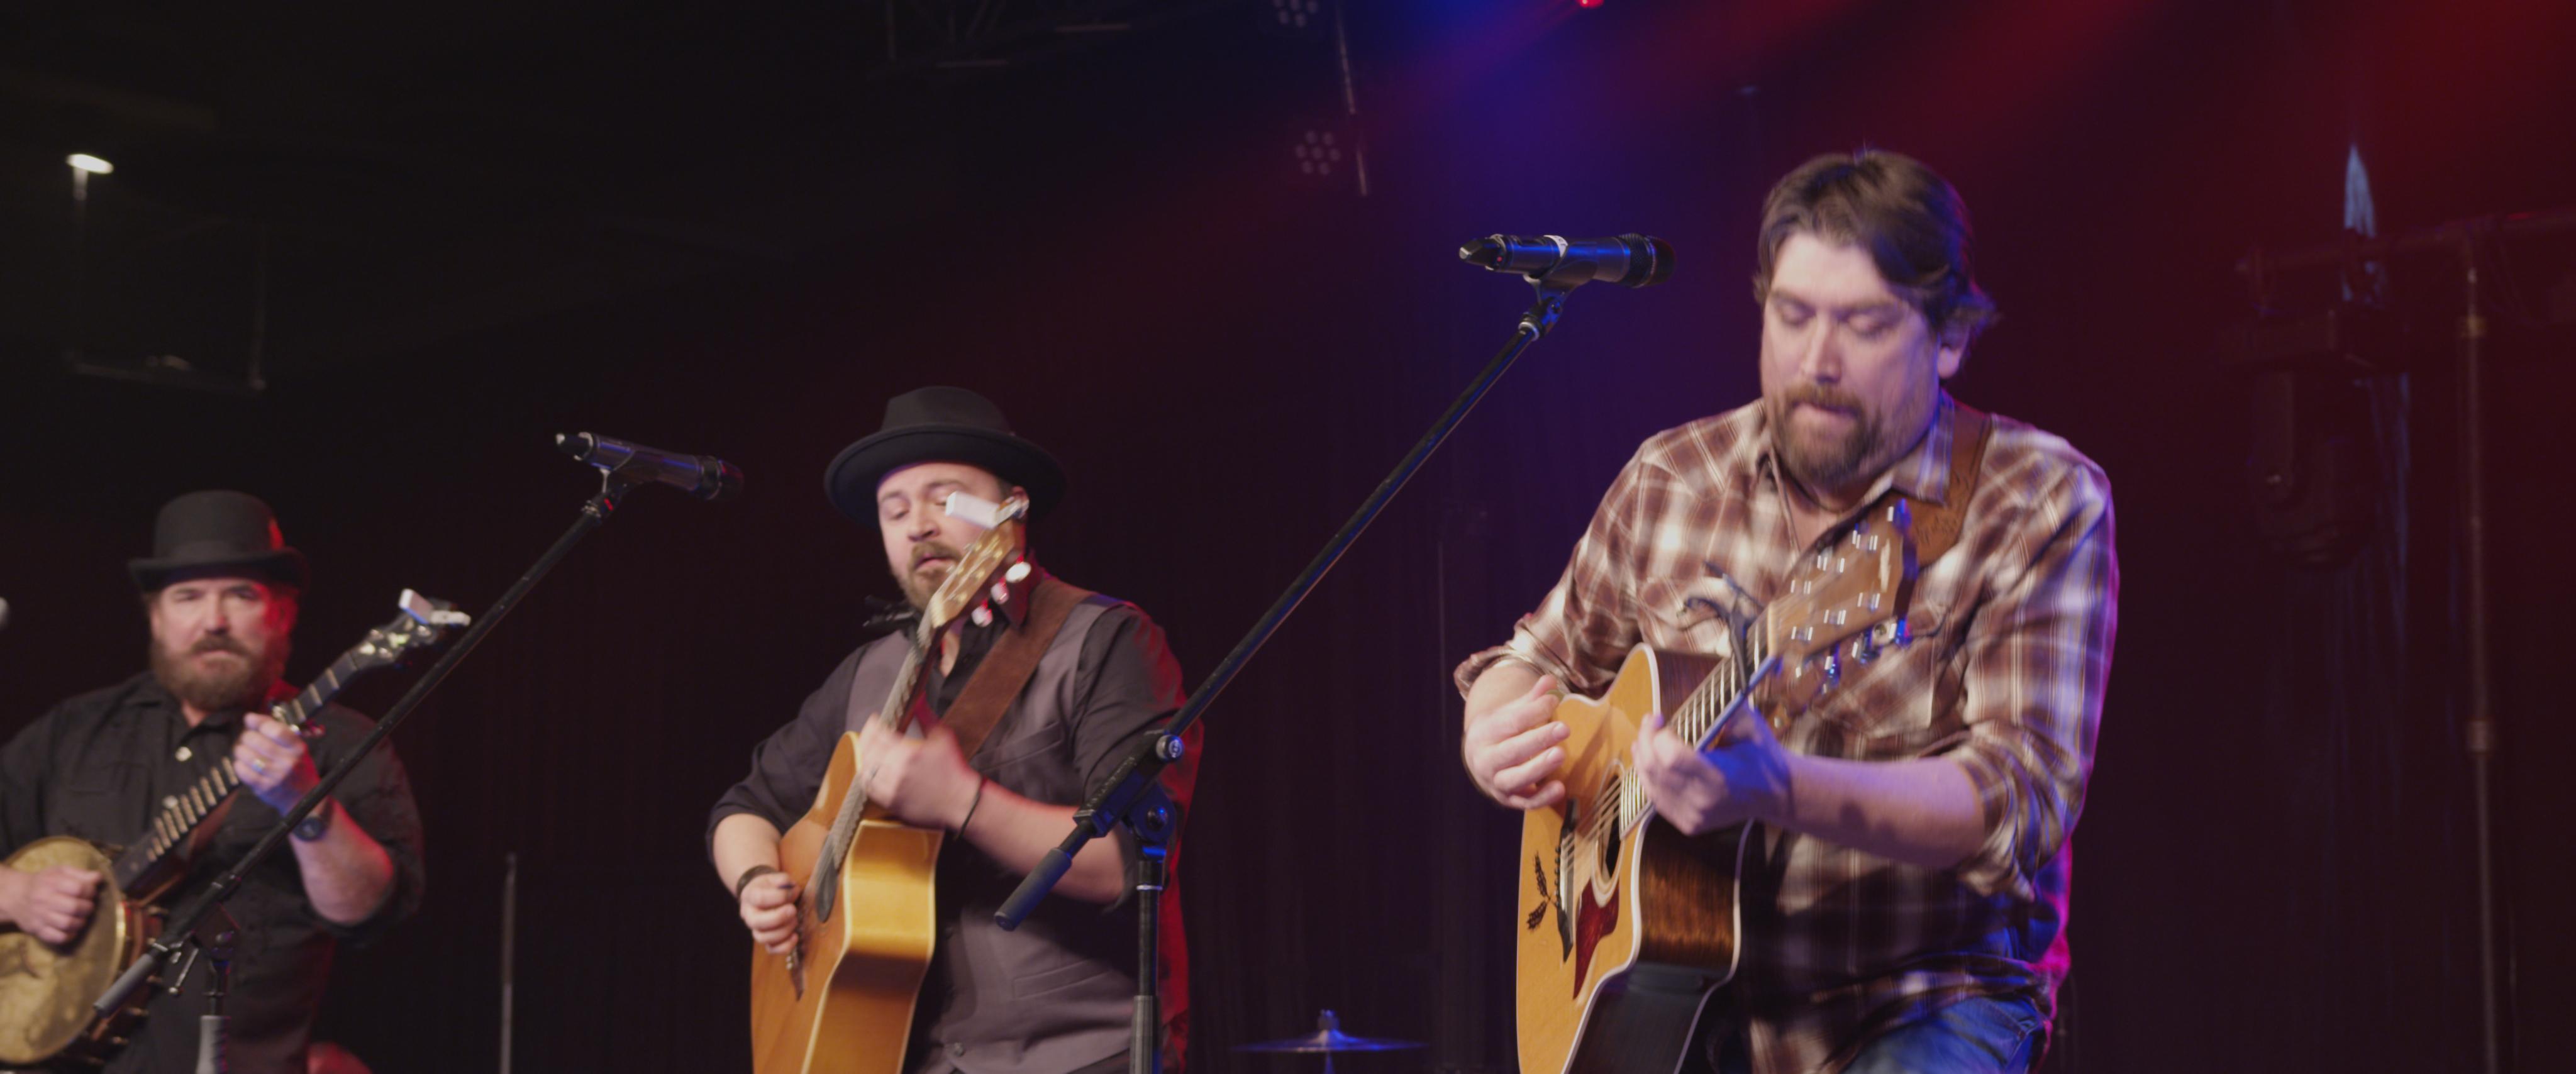 Blake Reid Band - 2017 ACMA's 16